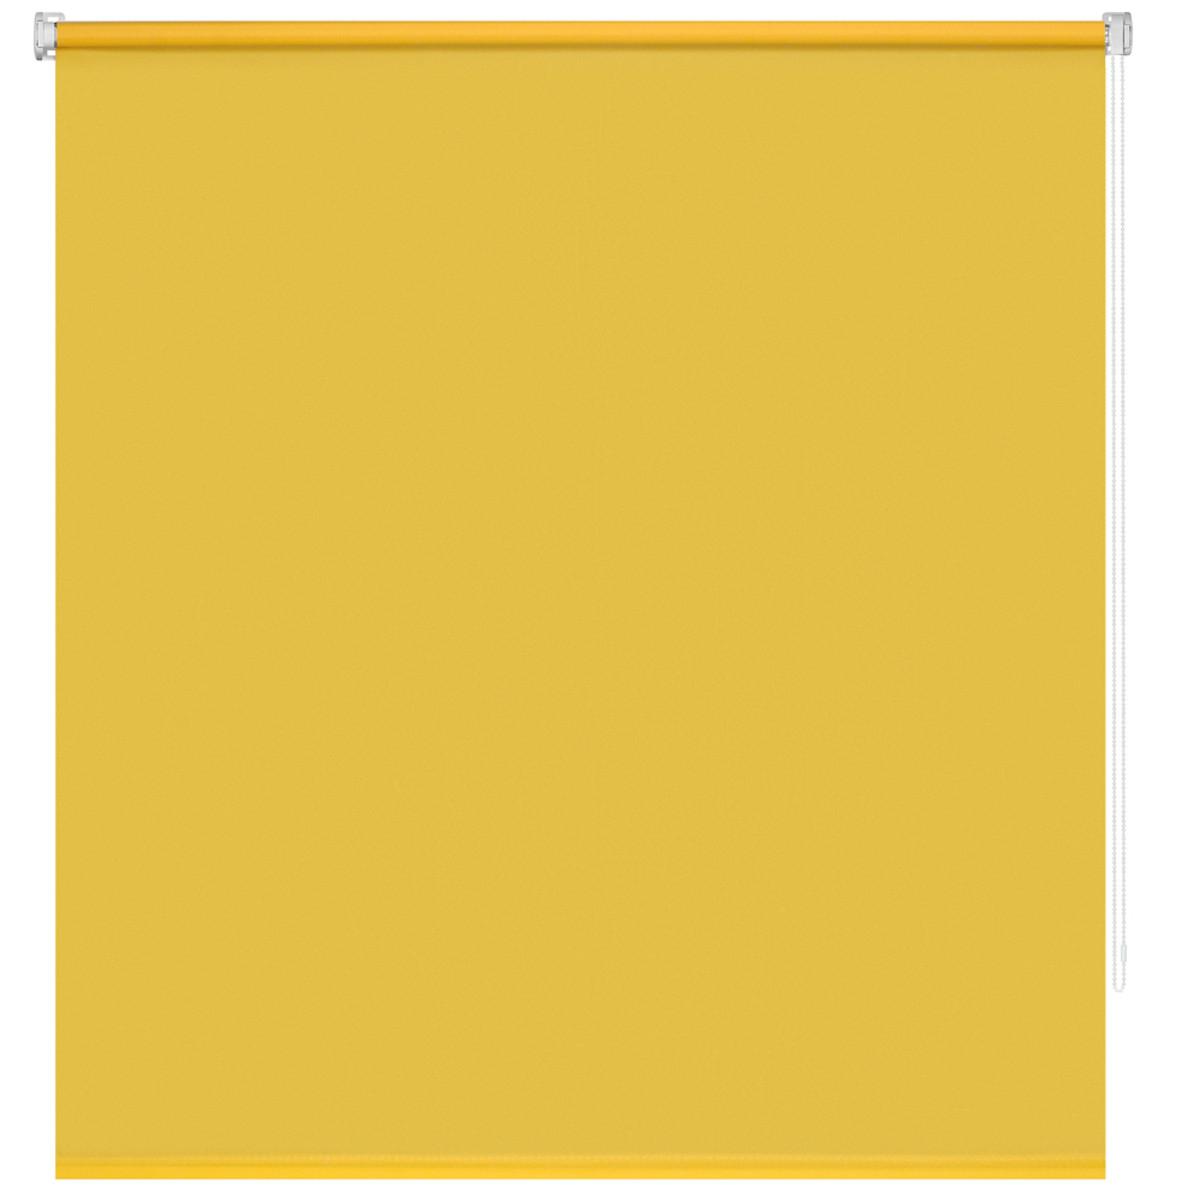 Рулонная Ора Decofest Плайн 140Х175 Цвет Желтый